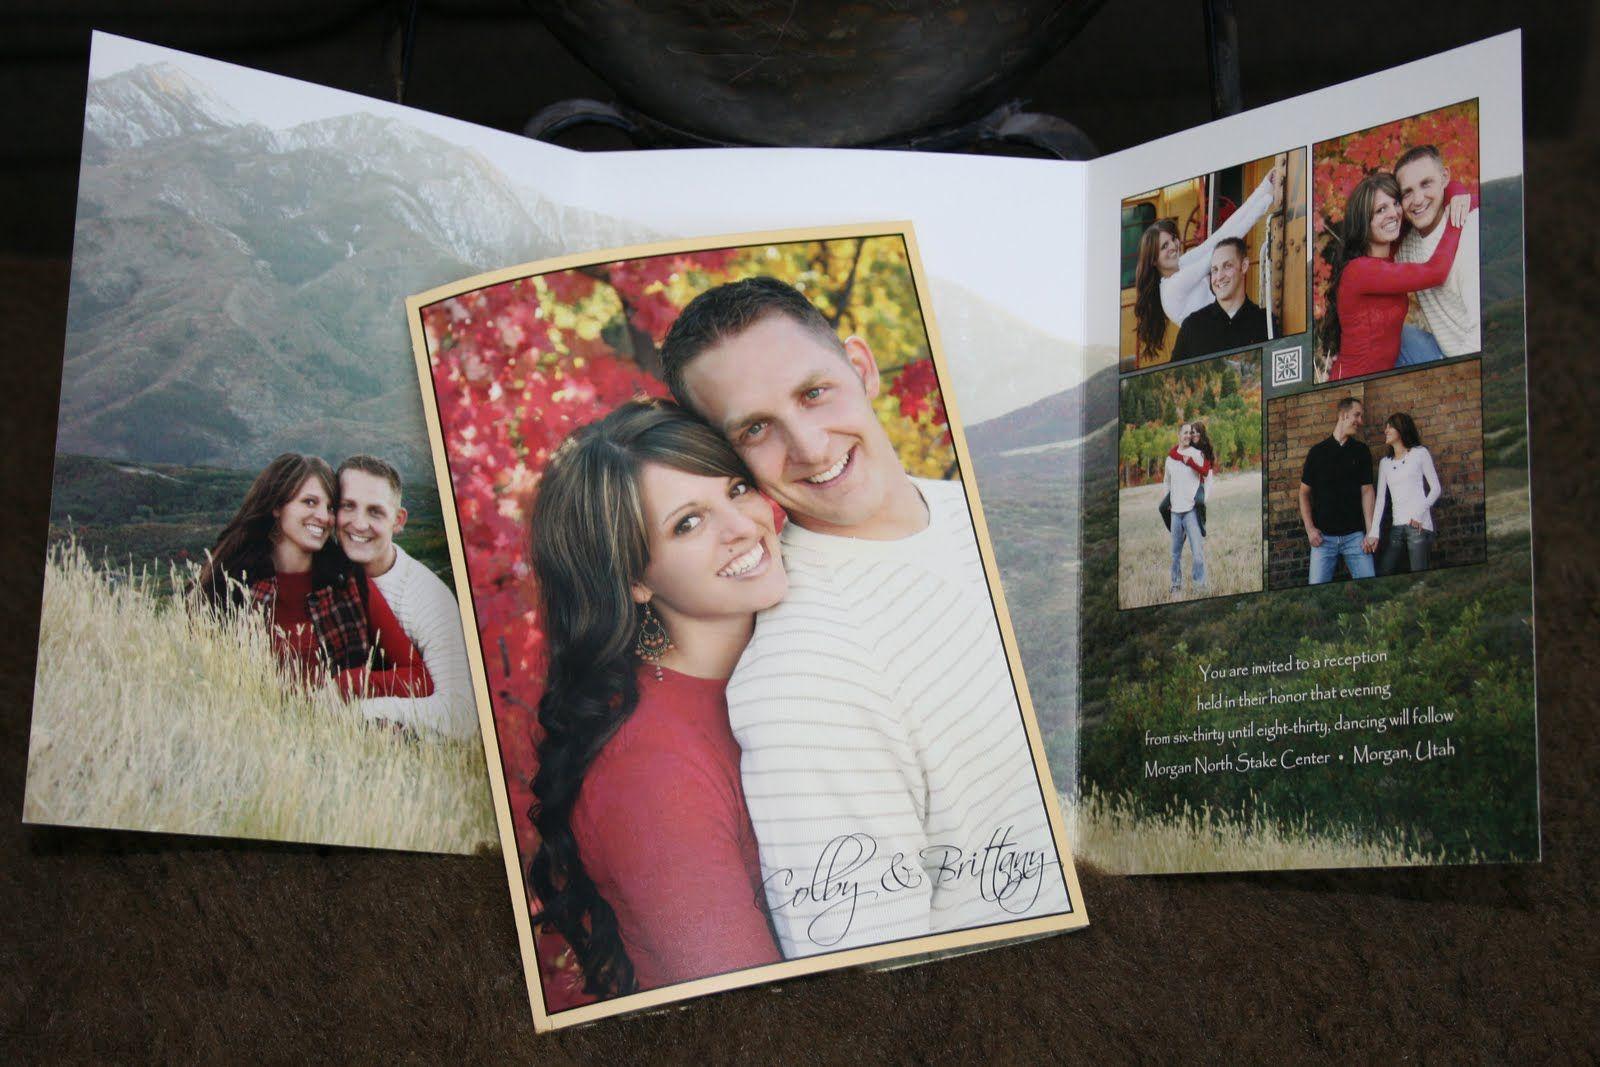 Diy wedding decorations photo album fall wedding invitations ideas